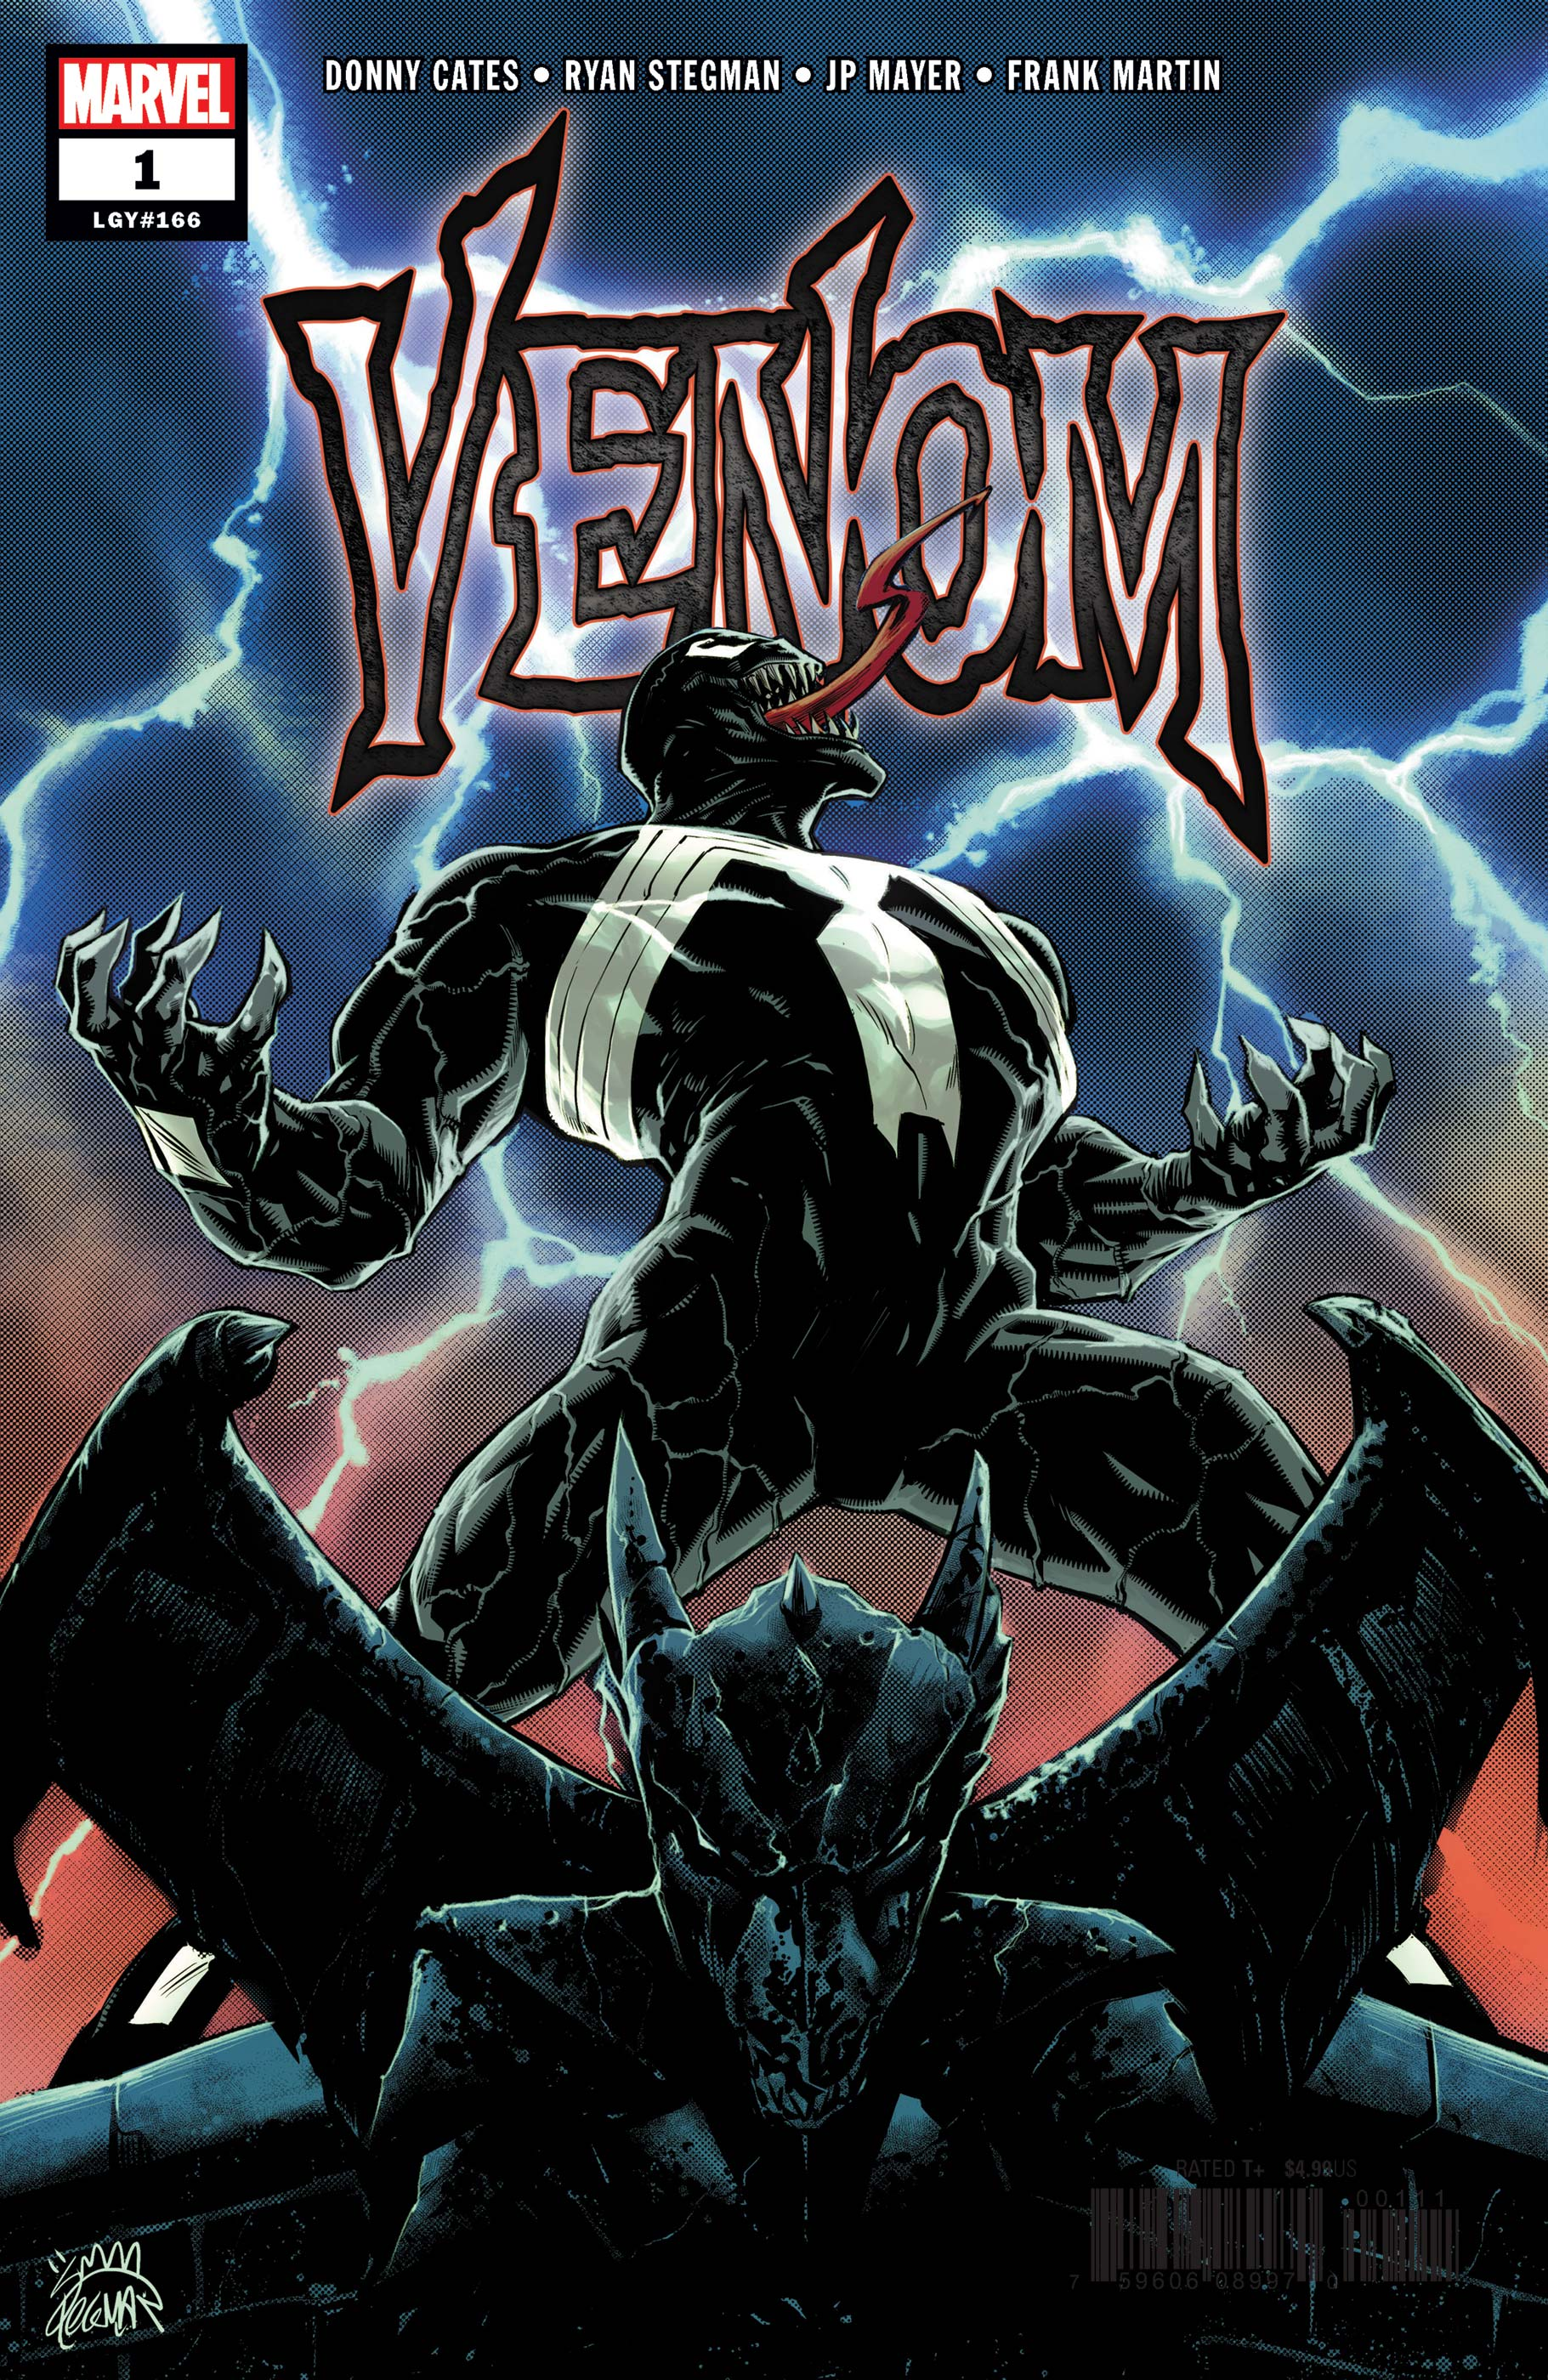 Venom (2018) #1